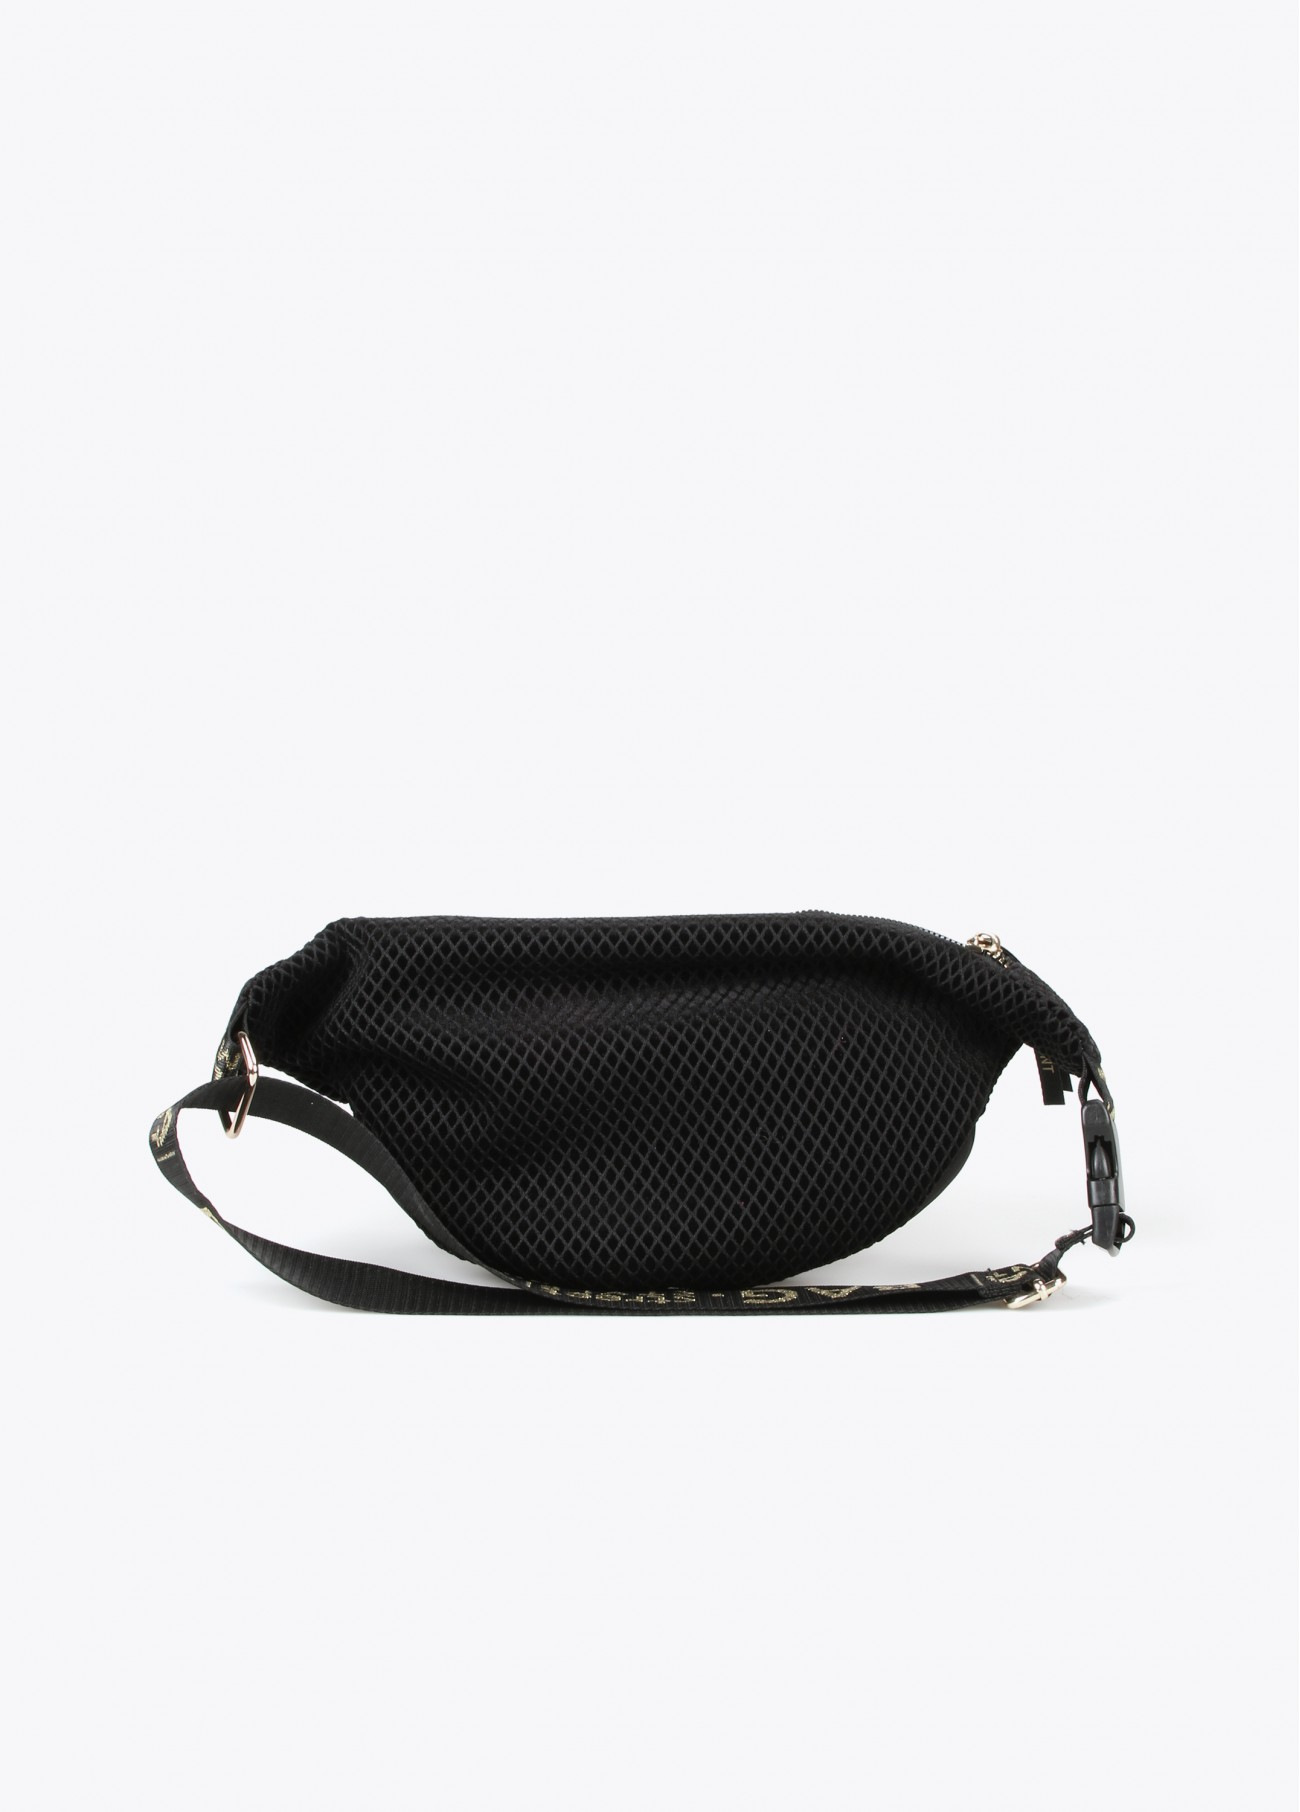 Riñonera bolsillos metálicos, negro 2